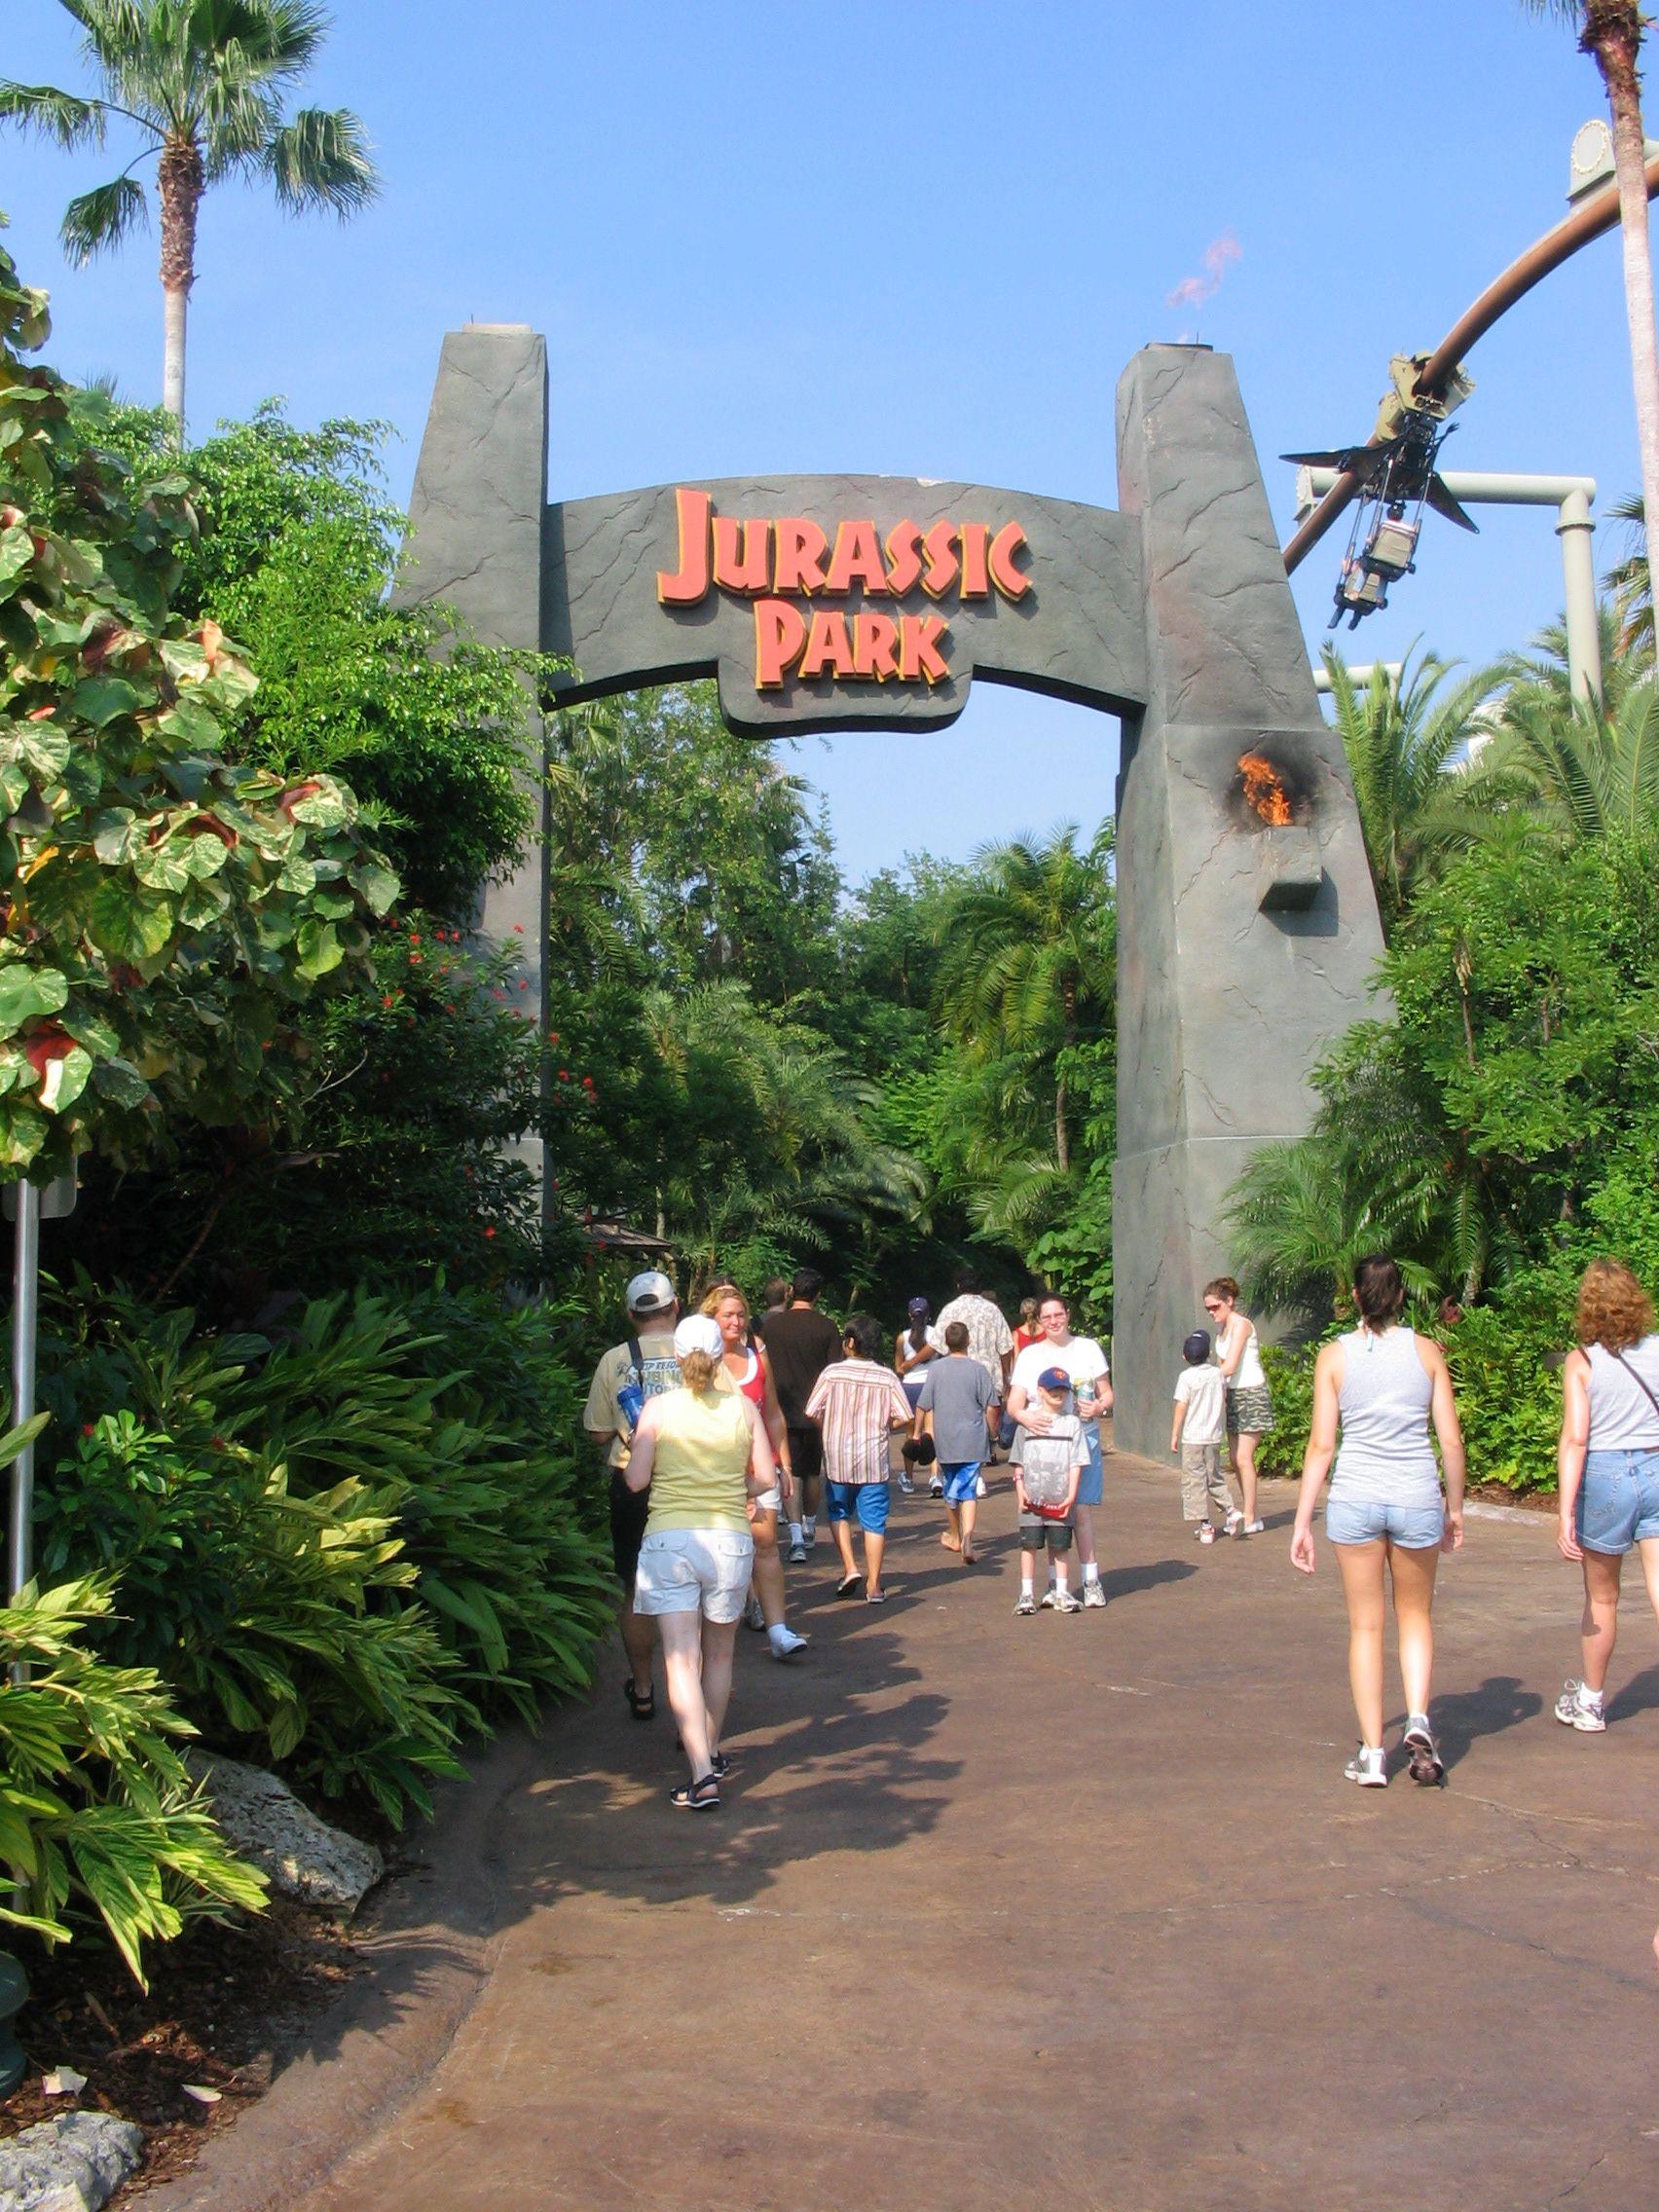 Jurassic Park At Universal Studios Theme Part In Orlando Fl Pics